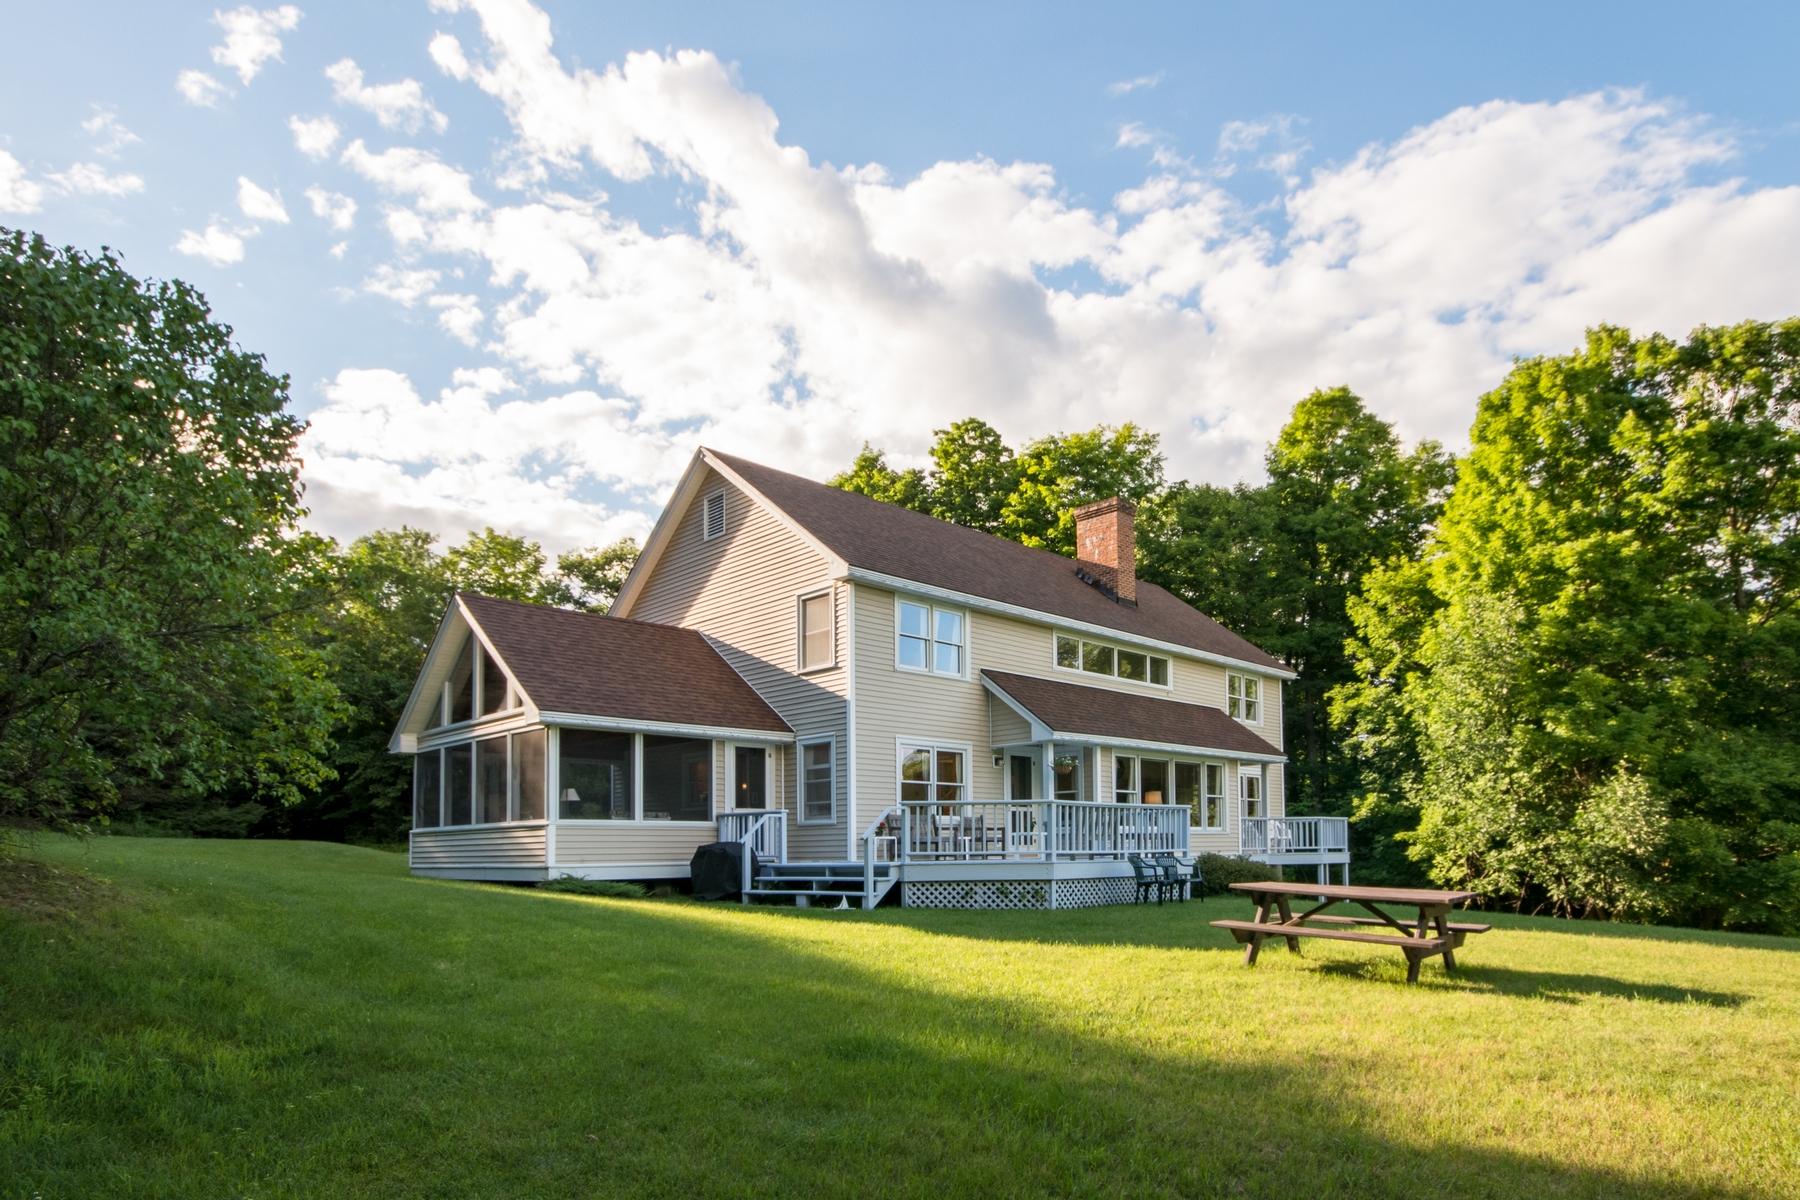 Additional photo for property listing at Beaver Brook Farm 231  Carver Lane Willsboro, Nueva York 12996 Estados Unidos